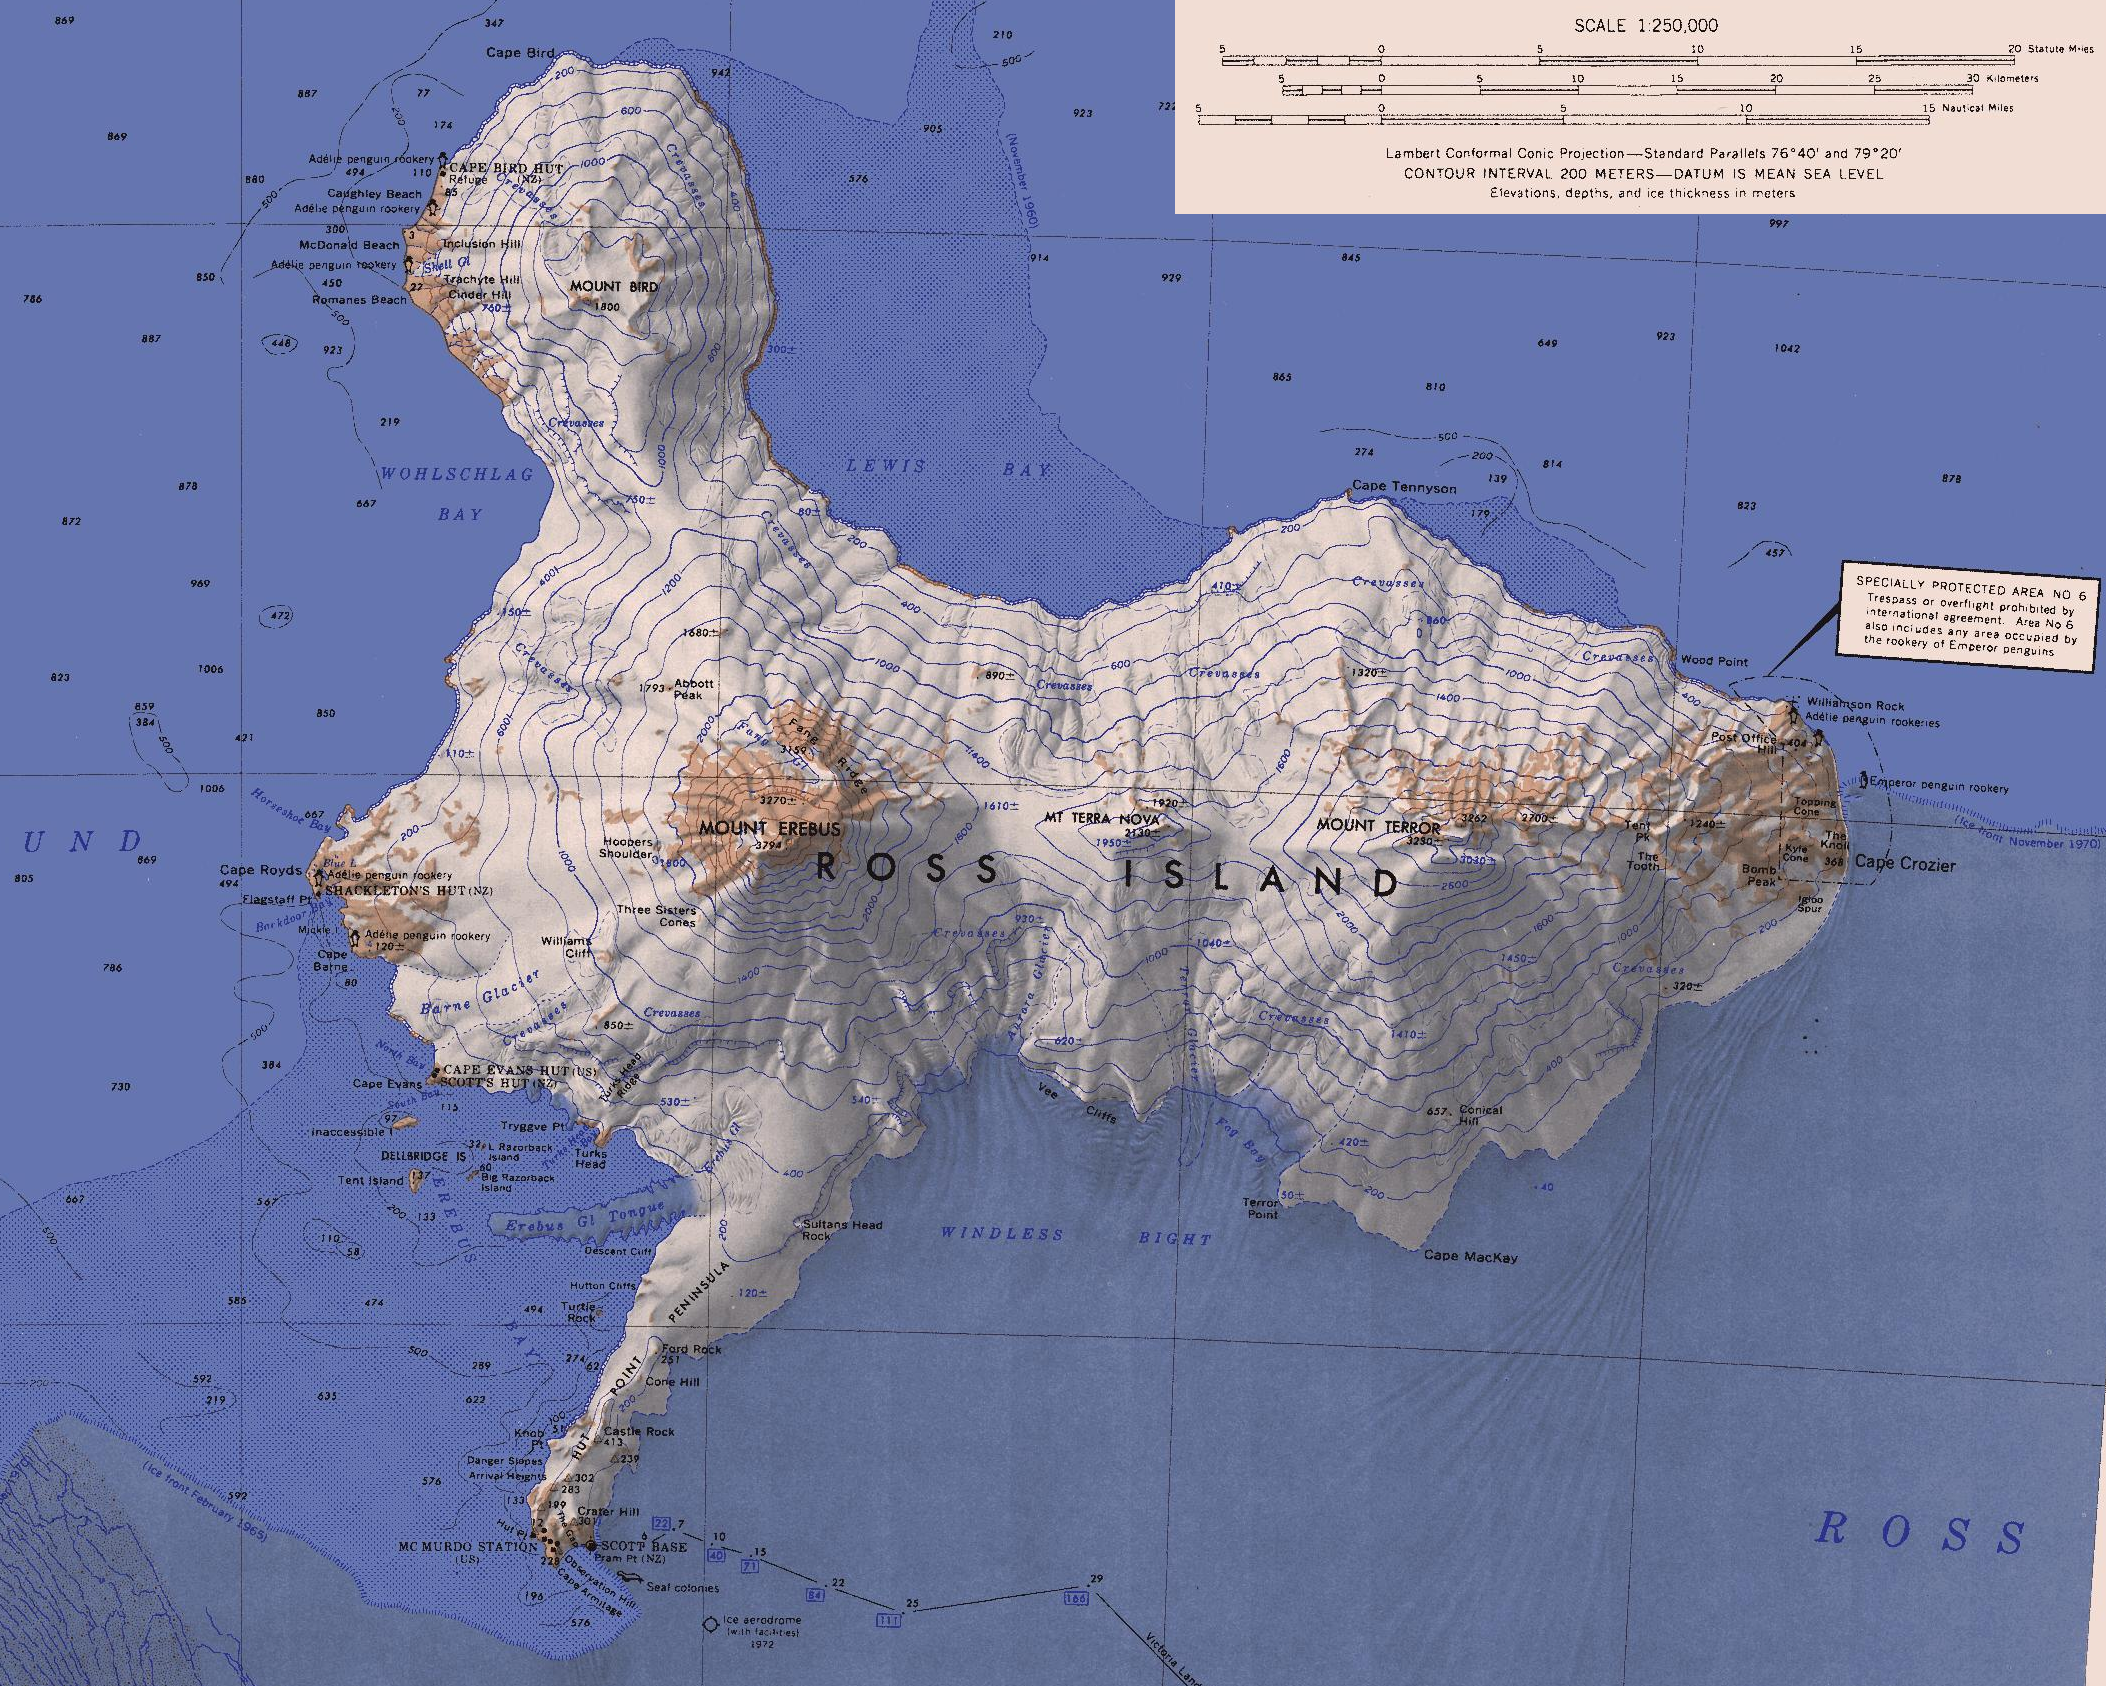 ross_island_map_usgs_250k.png